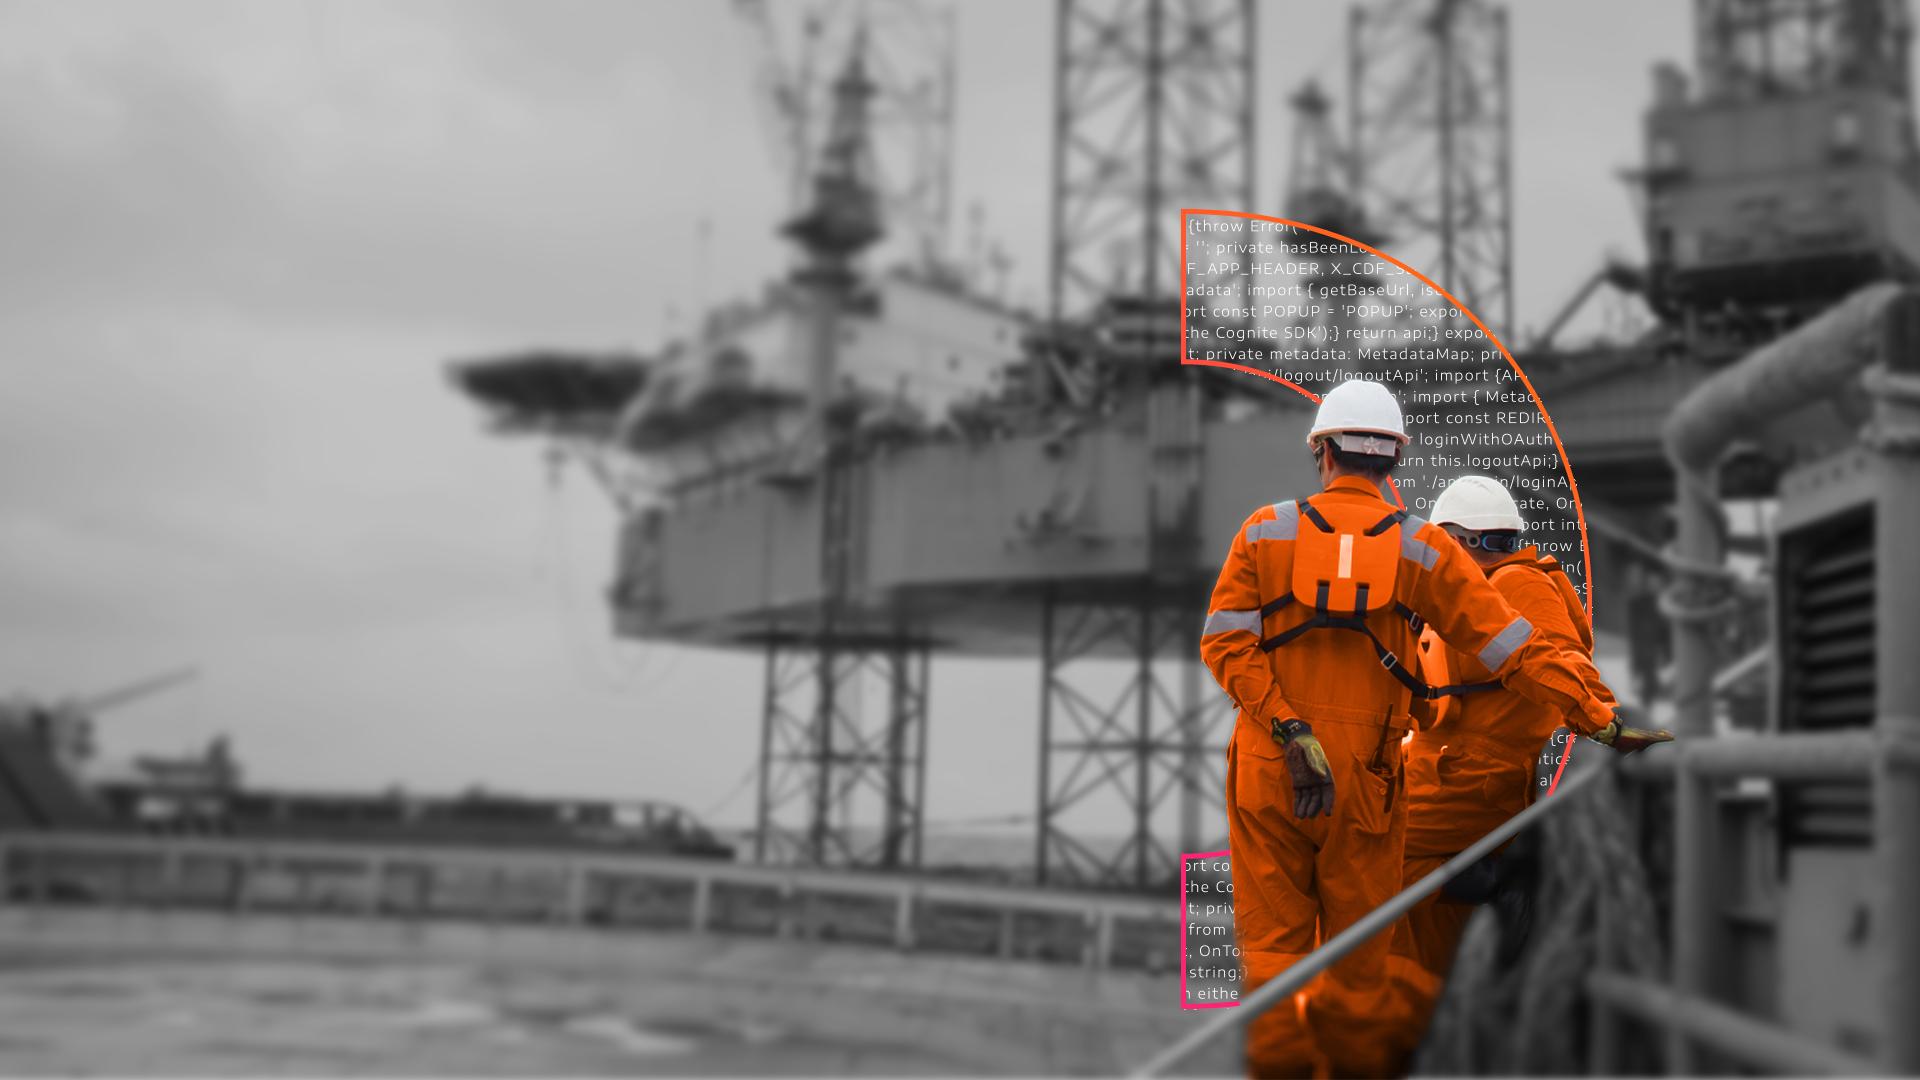 MDDM offshore worker 3